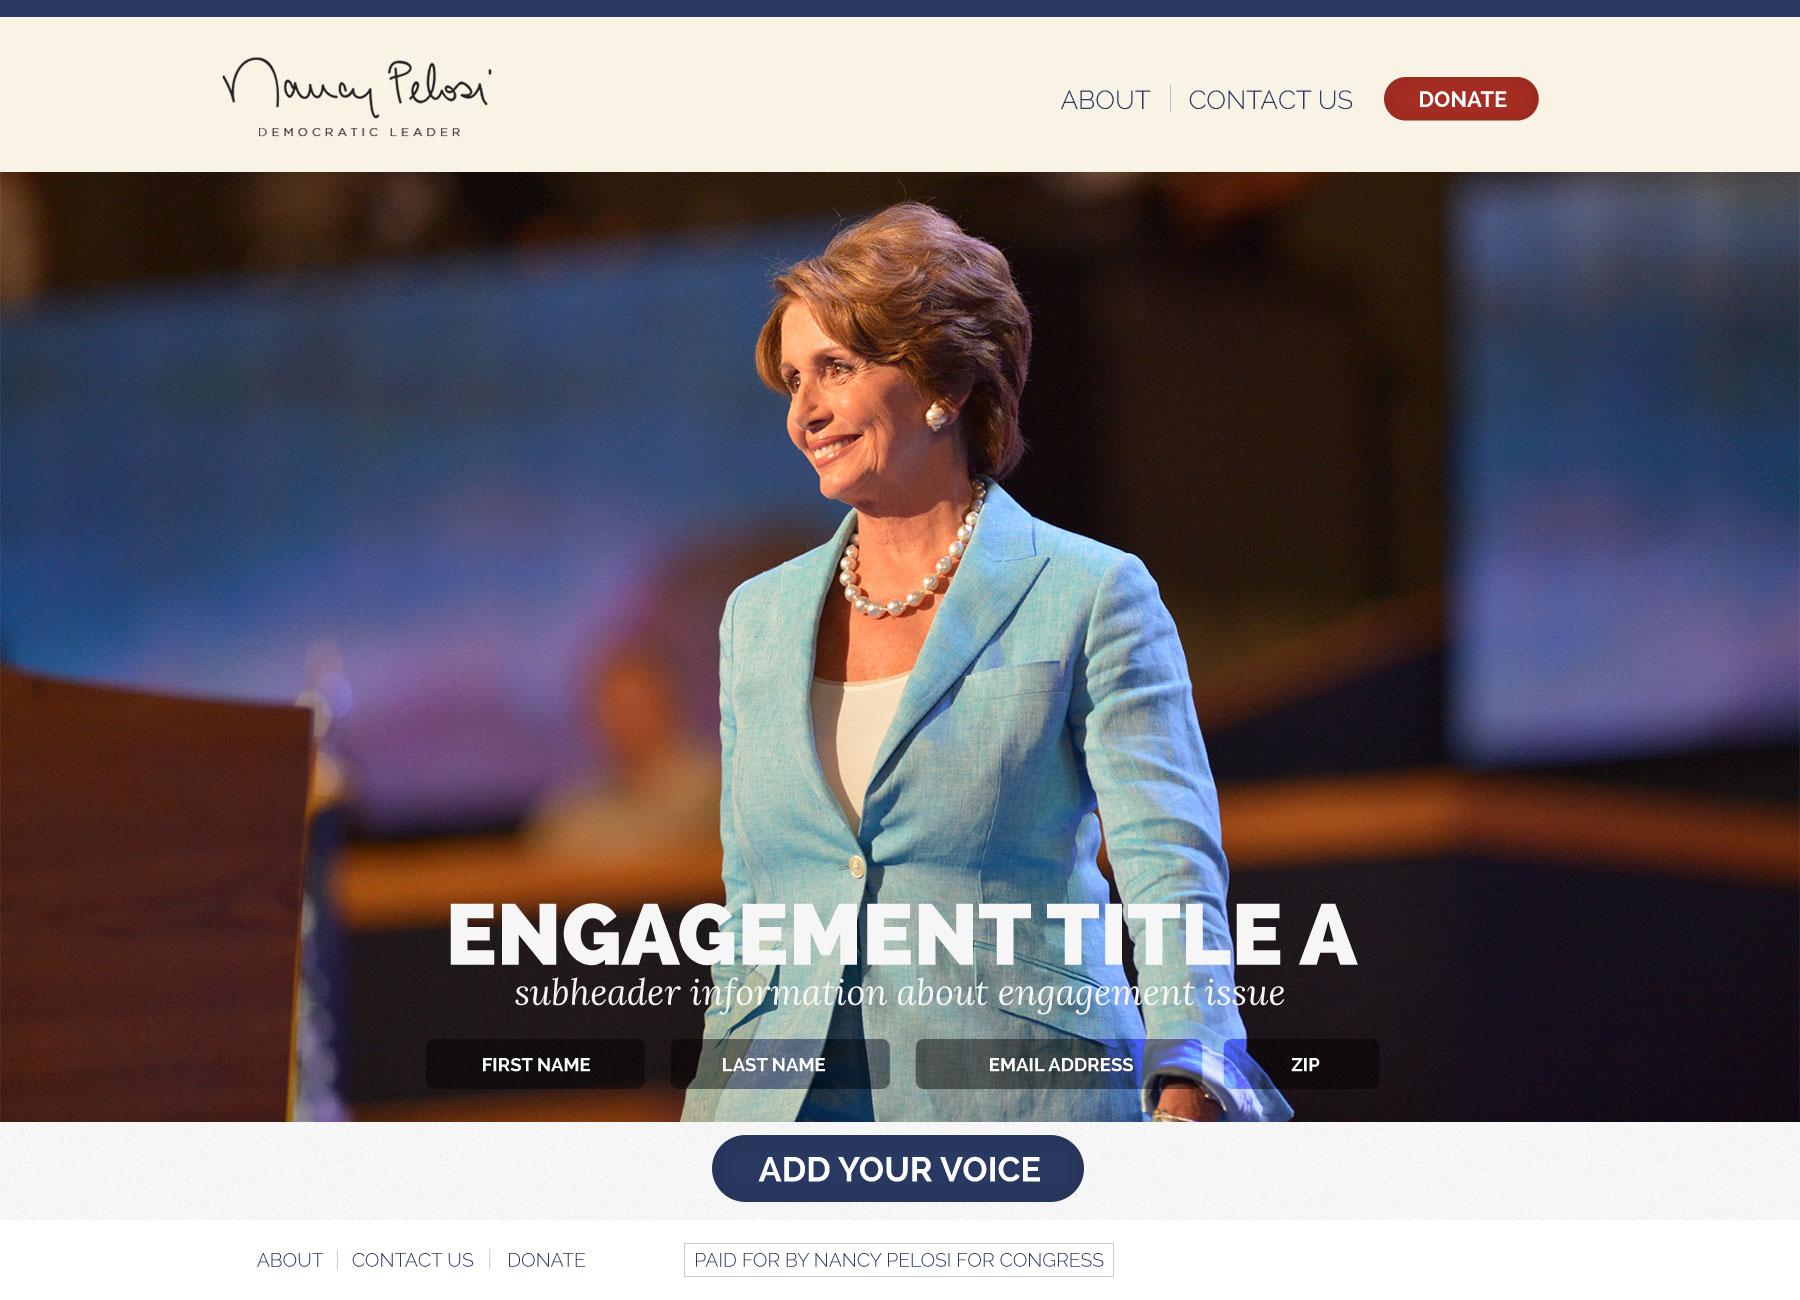 Nancy Pelosi for Congress 2014 campaign website